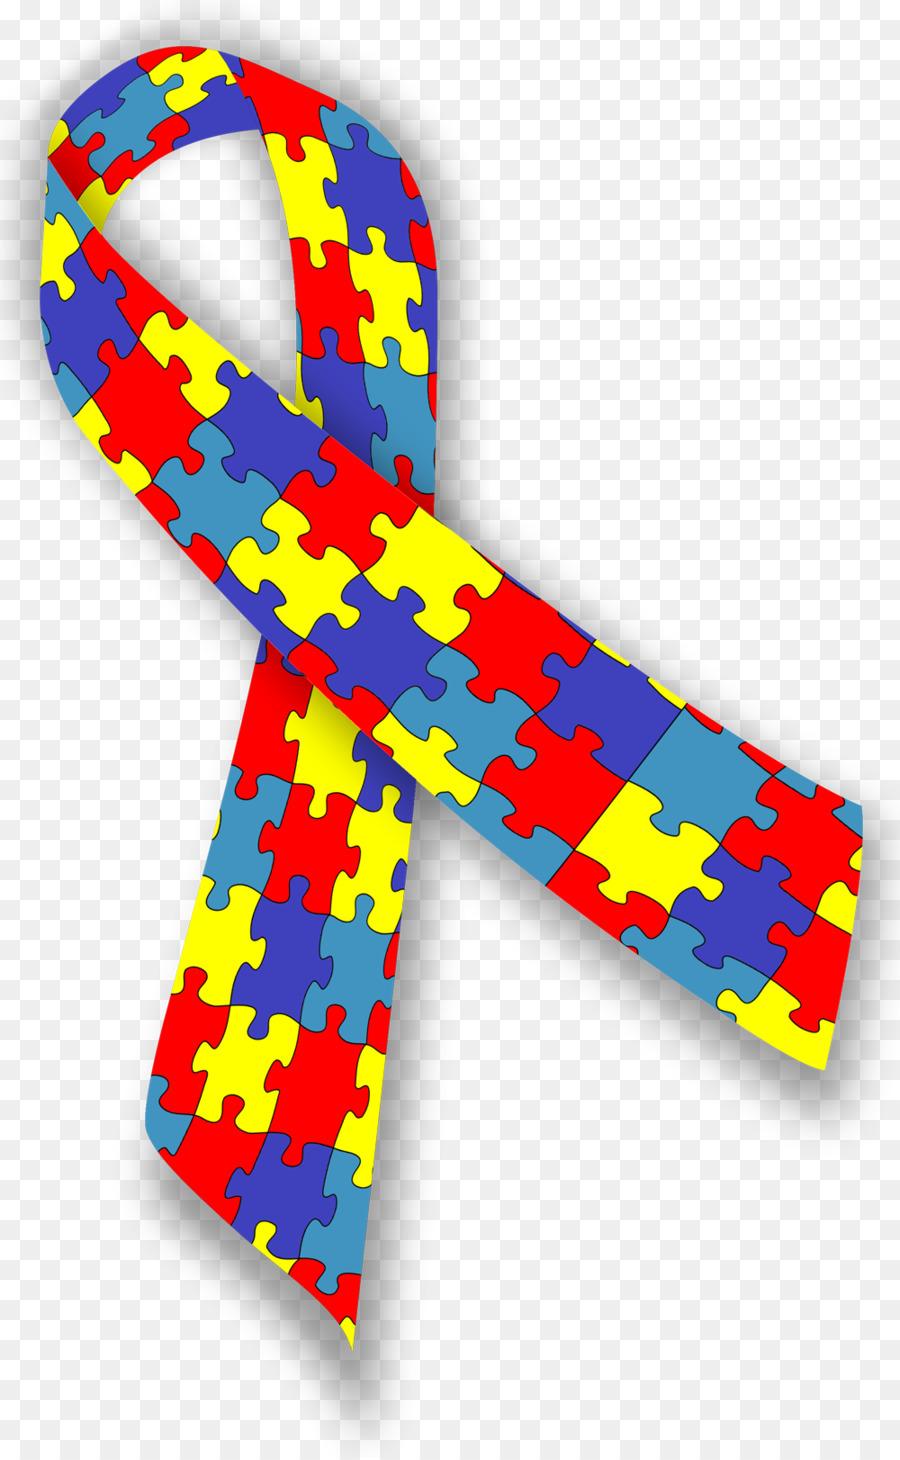 Autism clipart asperger. Syndrome autistic spectrum disorders